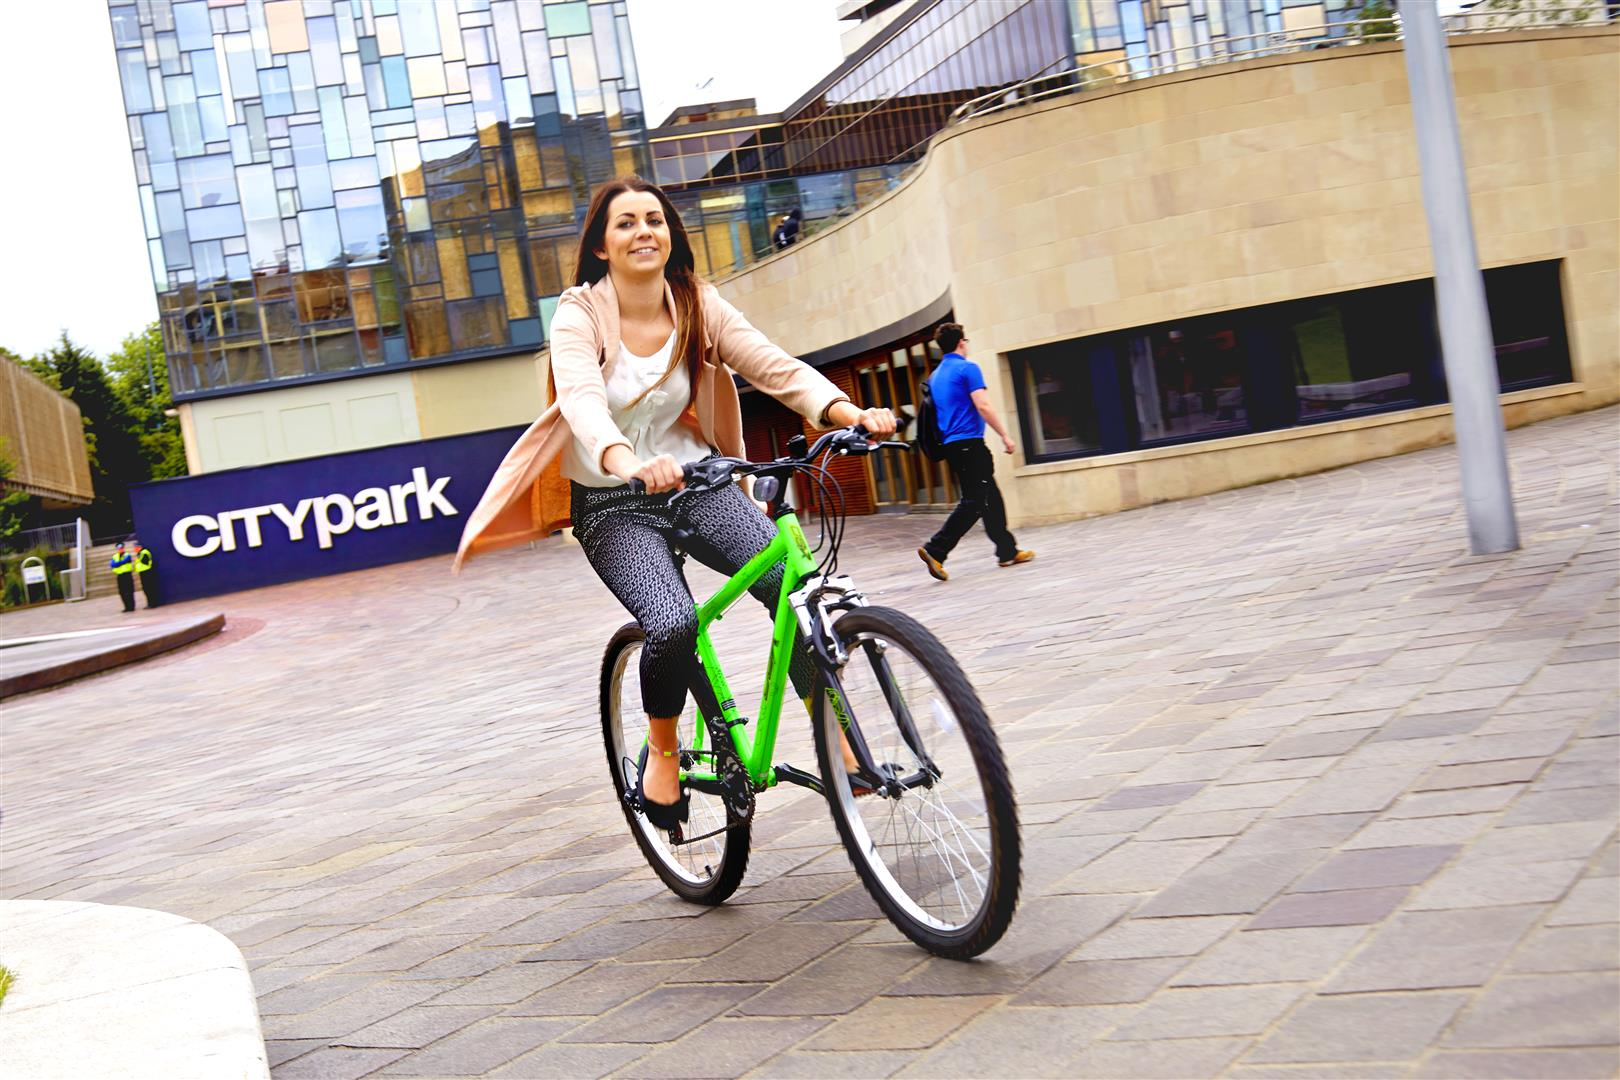 Cycling event coming to City Park, Bradford, 11 - 12 May. @bradfordmdc  @CityParkBD #cycleactivecity https://t.co/kkN5U9LxjF https://t.co/No0Xop9hx9